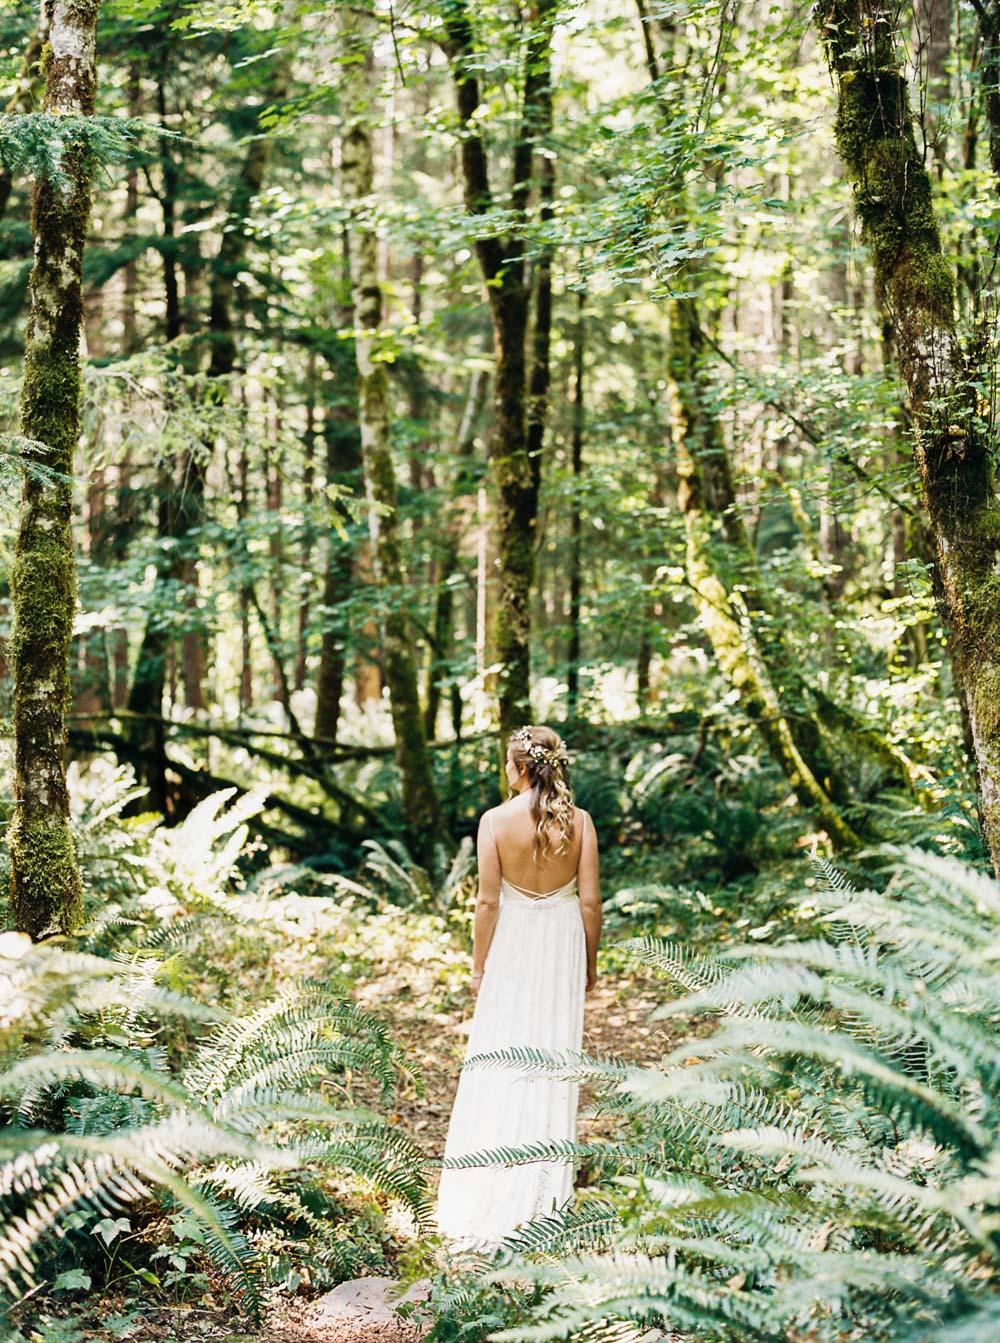 Bride wanders through forest at Wellspring Spa Wedding at Mt. Rainier